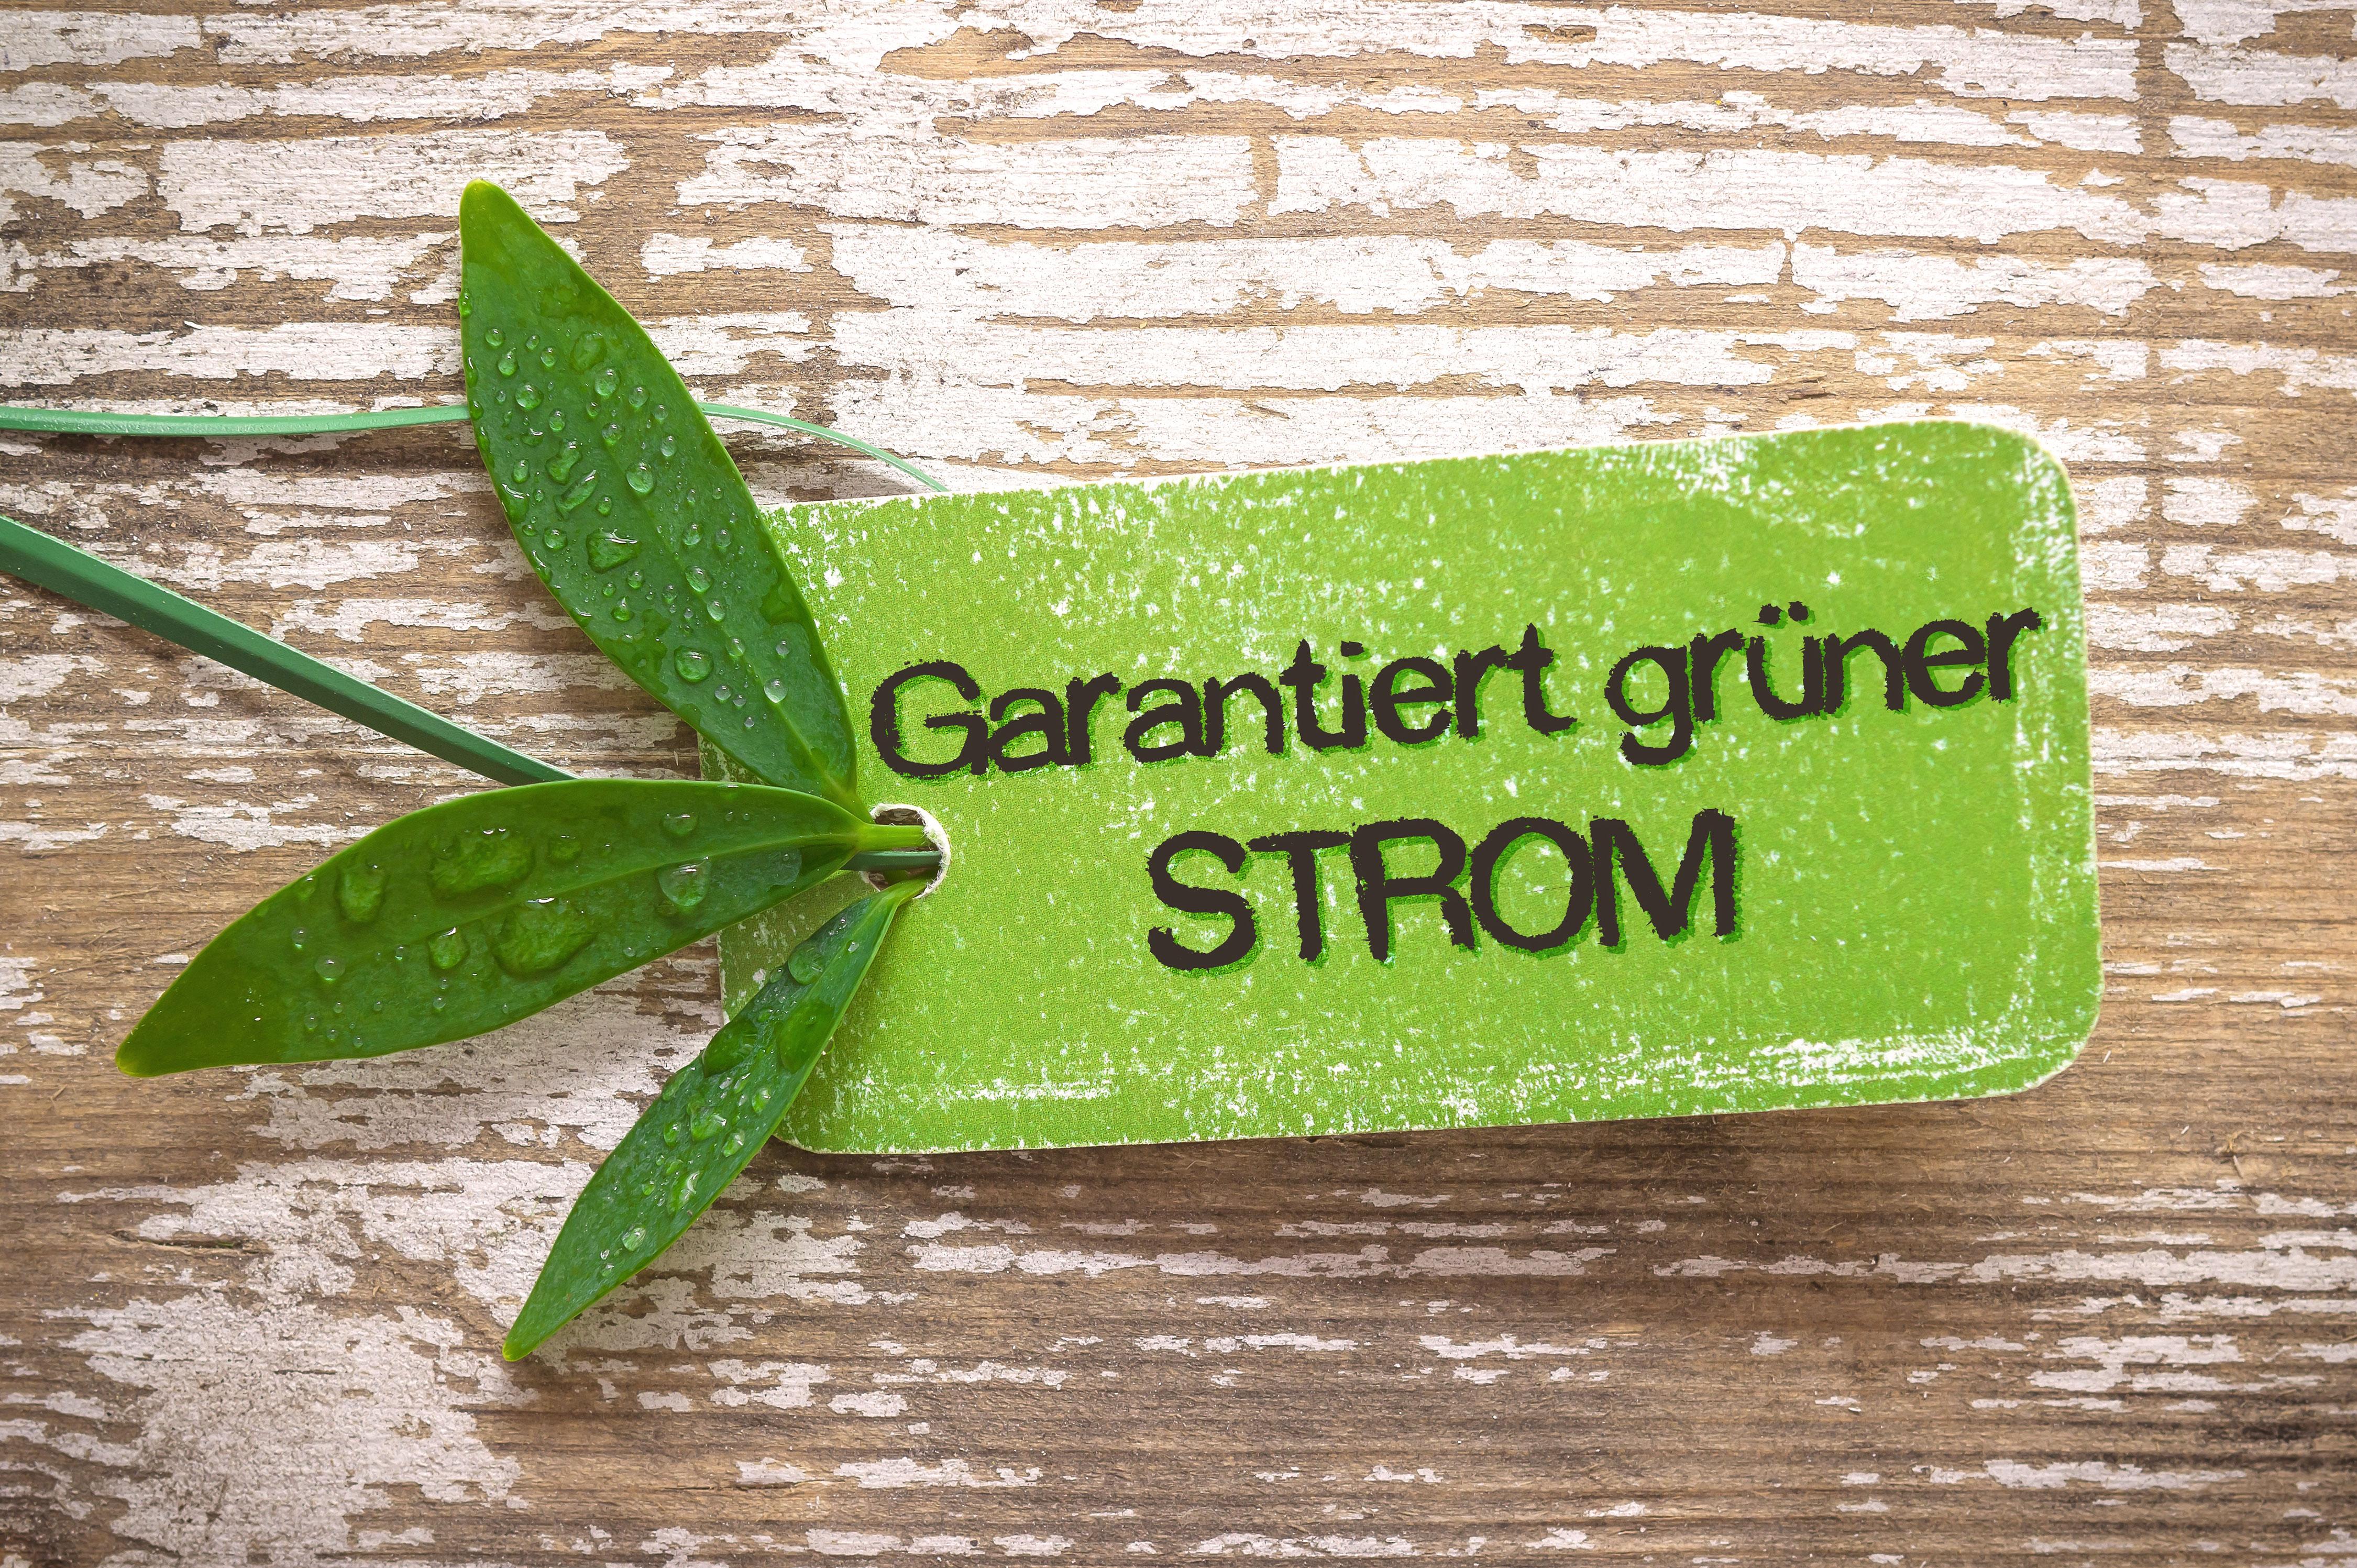 Label Garantiert grüner Strom